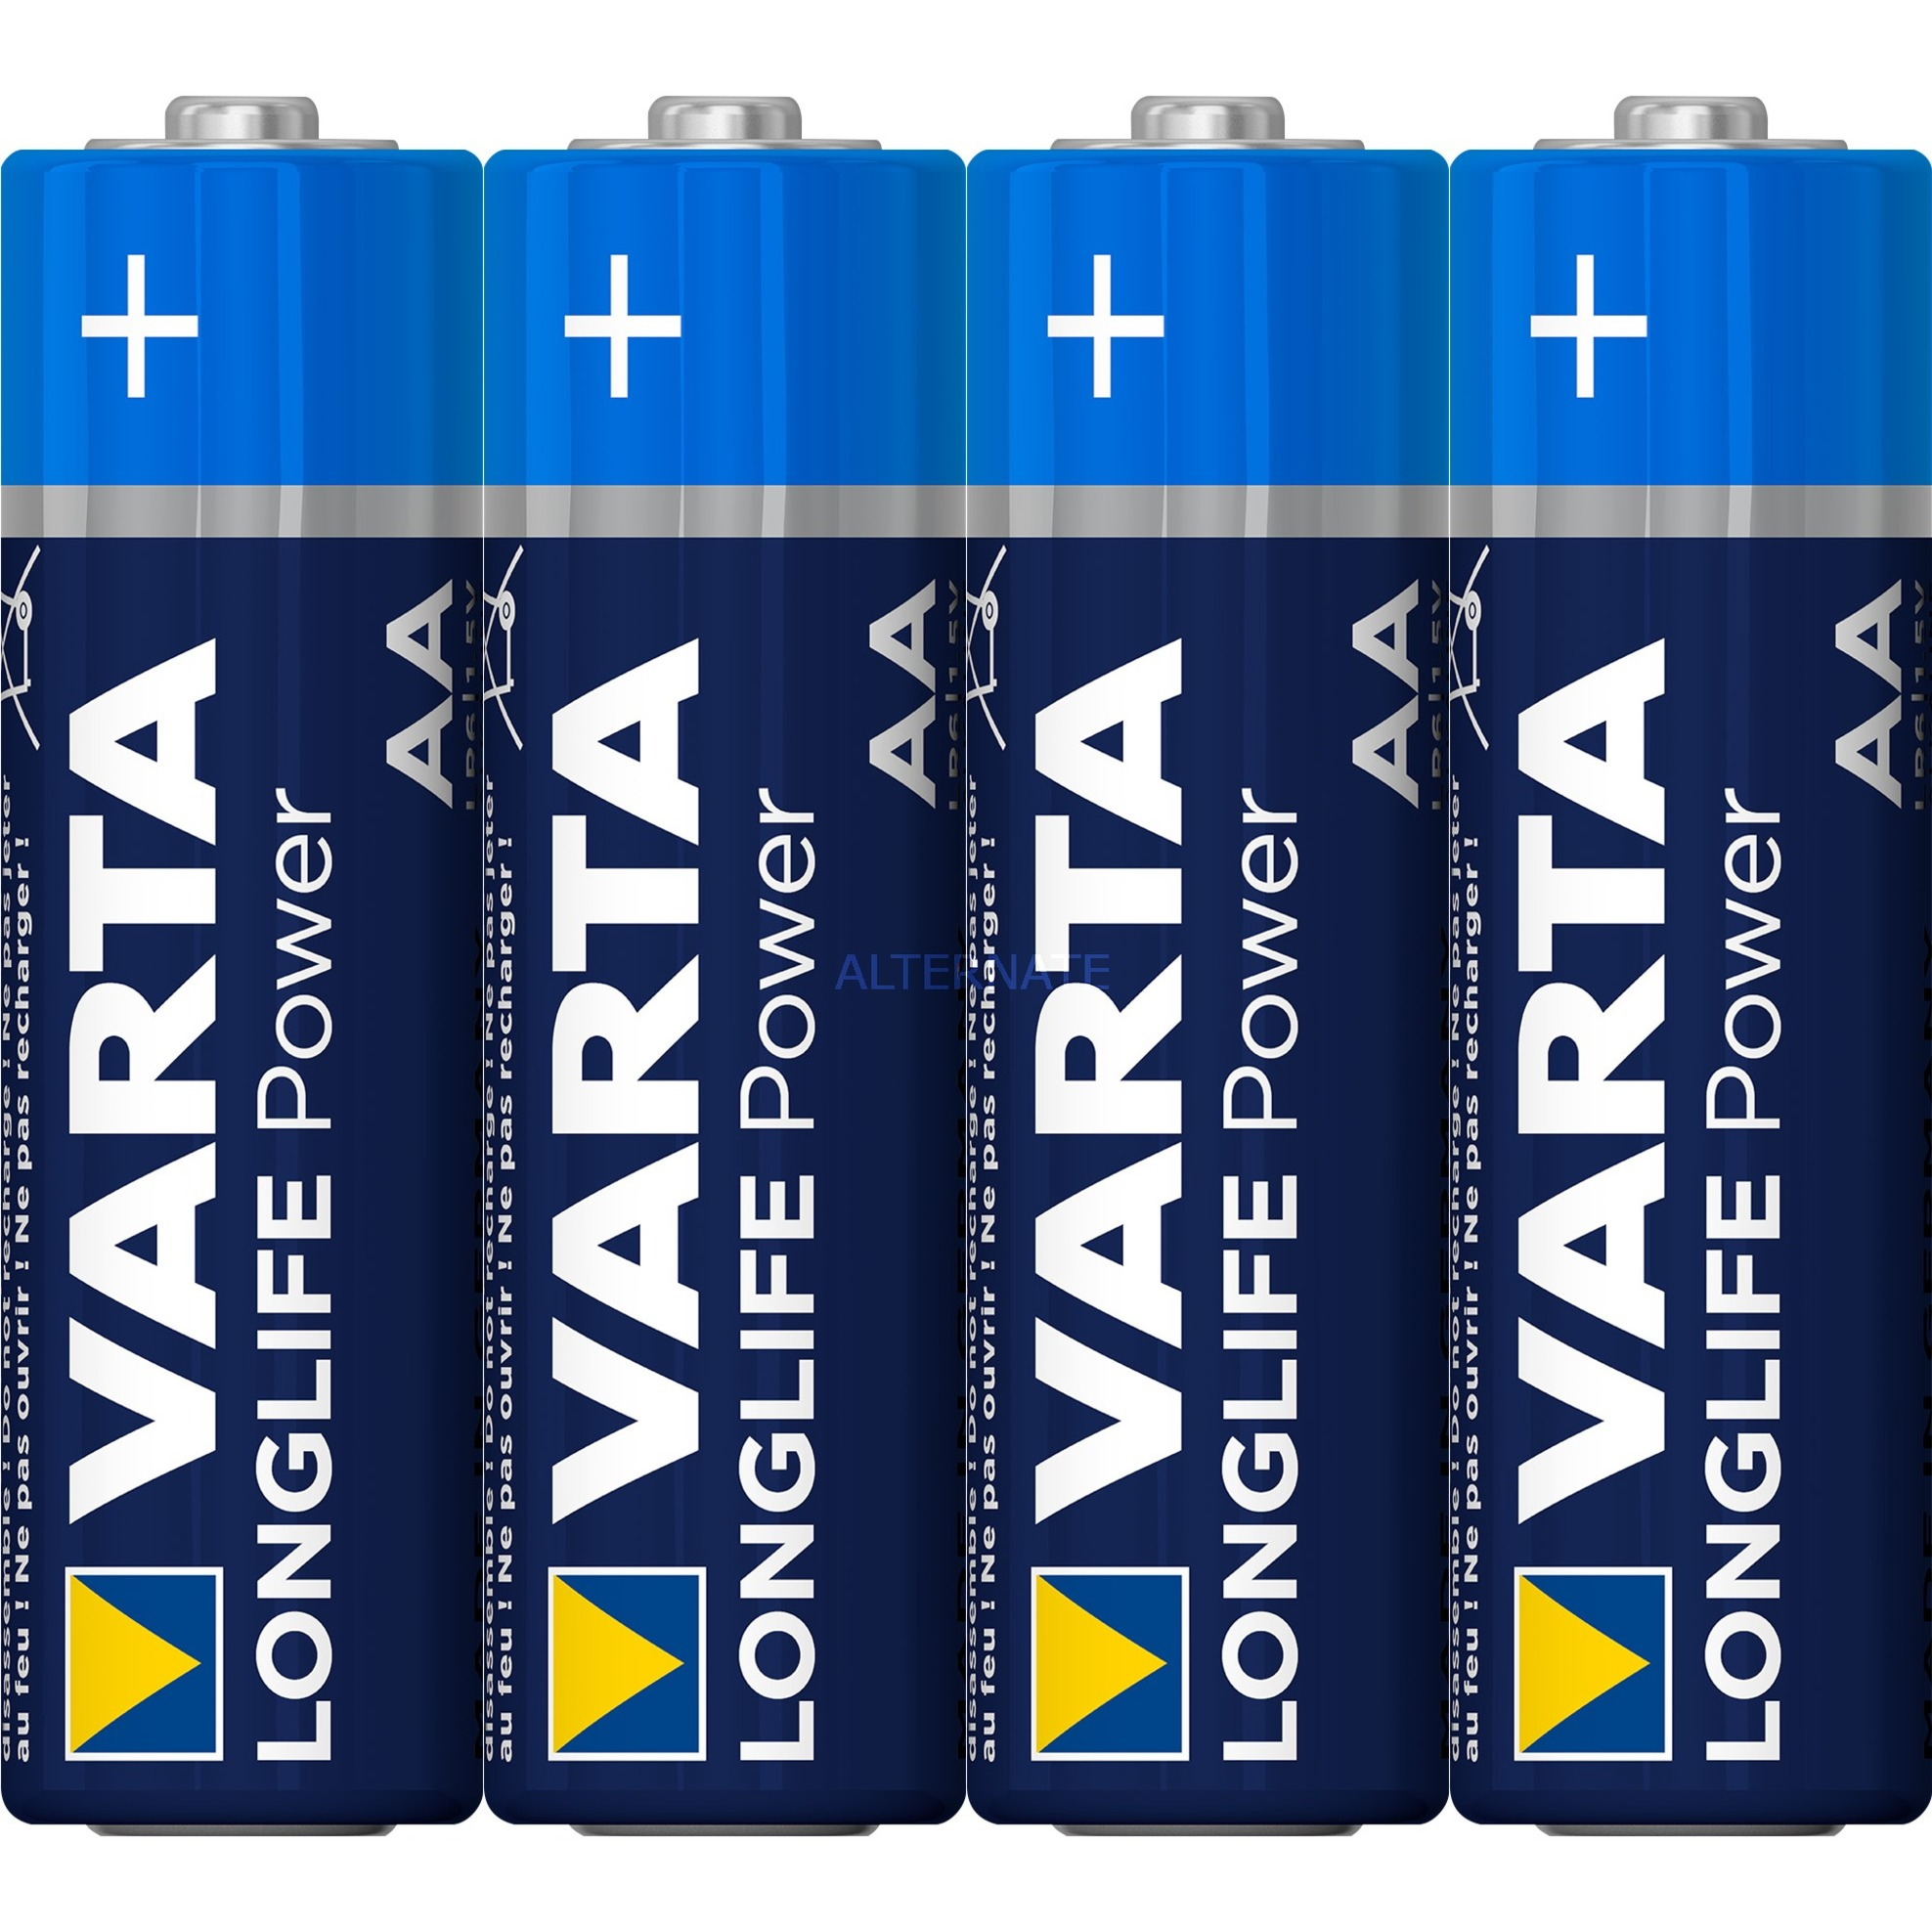 4906, 4-Pack Alcaline 1.5V pile non-rechargeable, Batterie